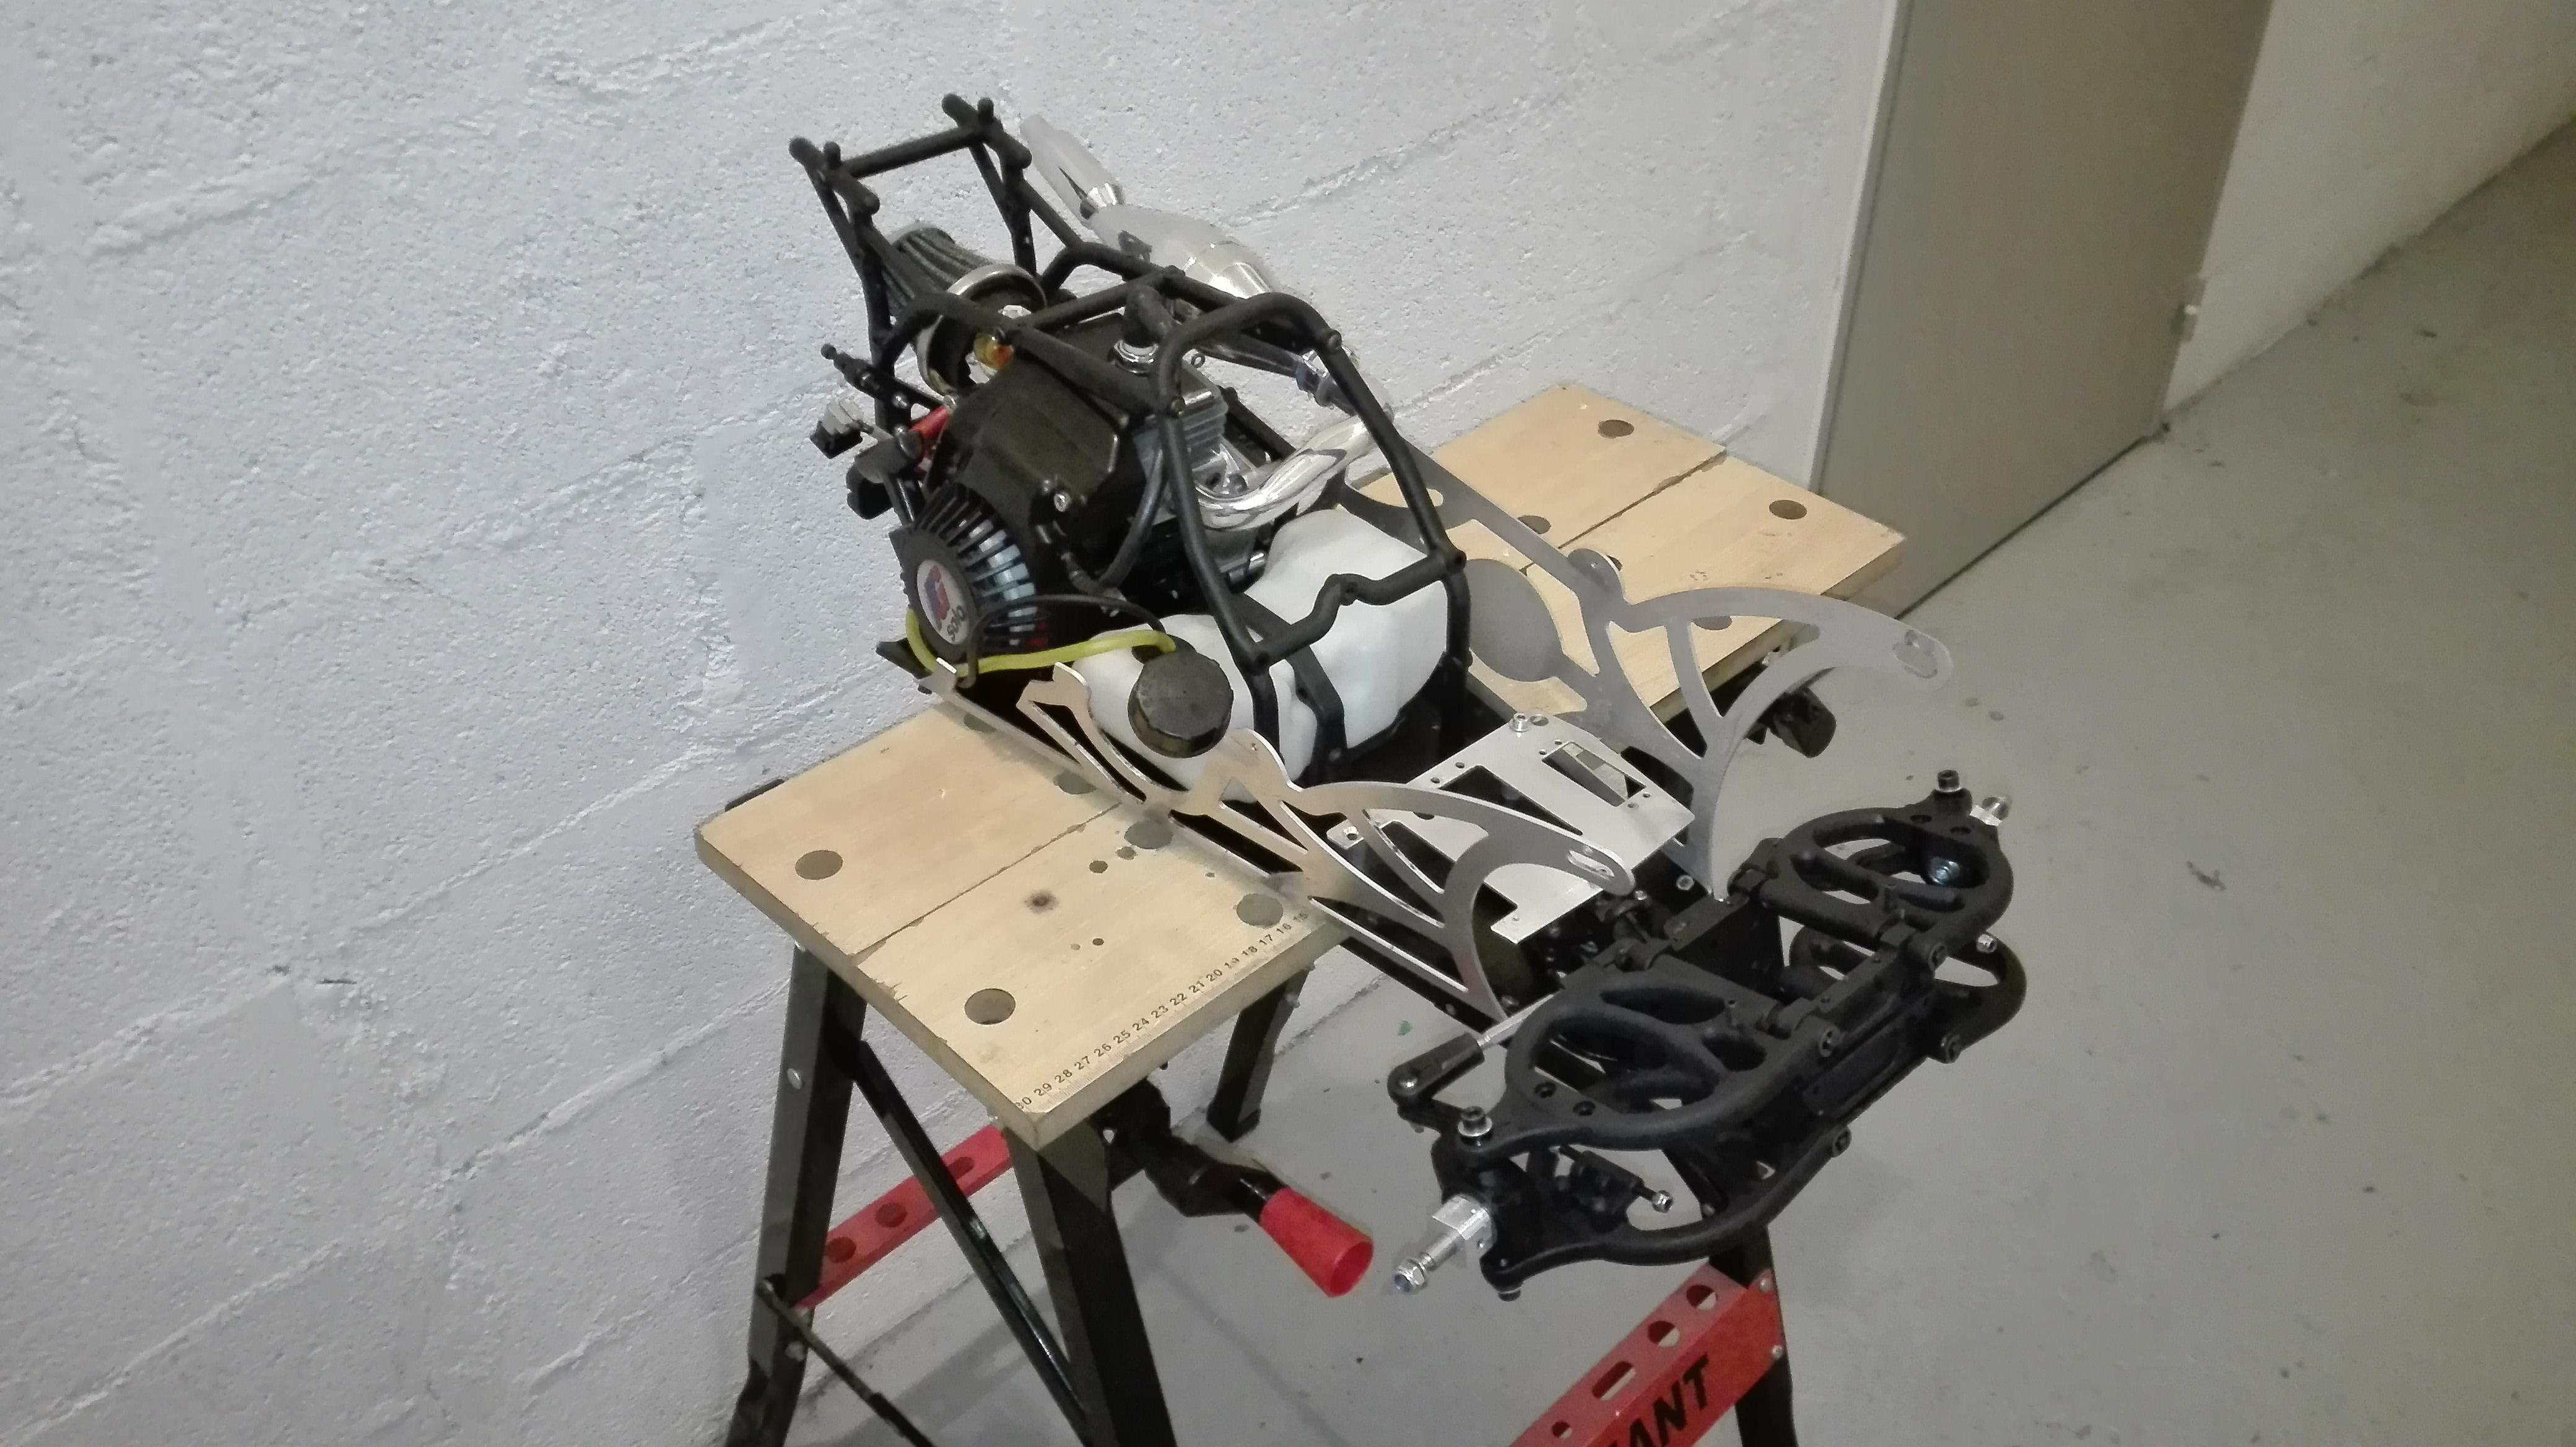 re-montage complet monster truck FG depuis un chassis nu - Page 2 180203080147339944